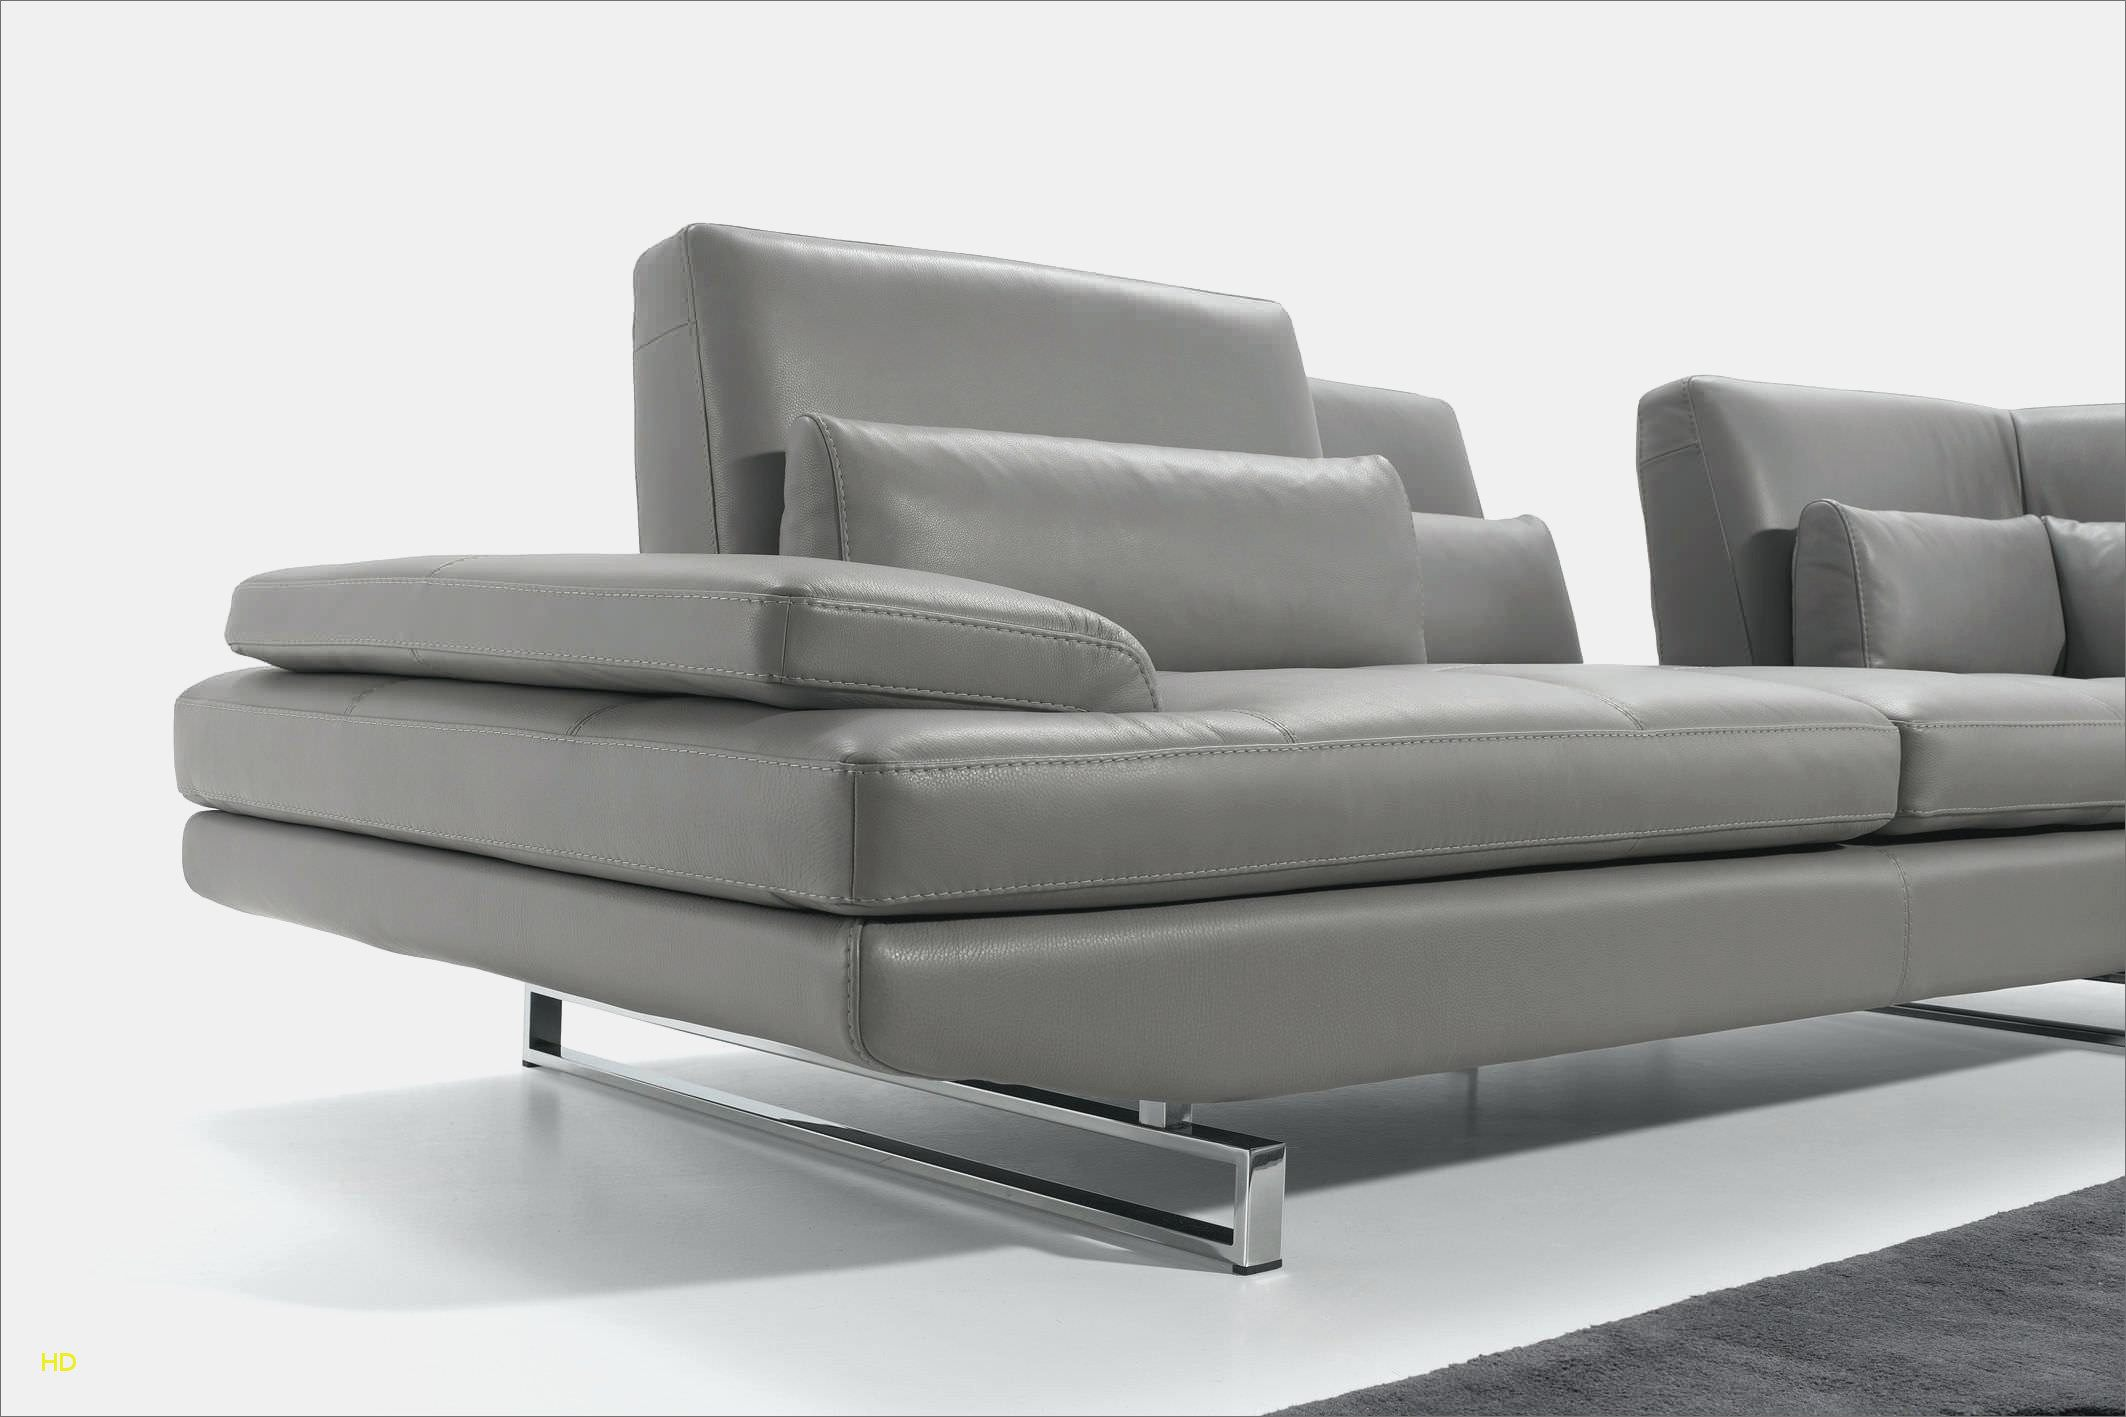 Canapé Lit Gigogne Ikea Douce attrayant Canapé Angle Convertible Conforama Avec Mod¨le Cuisine